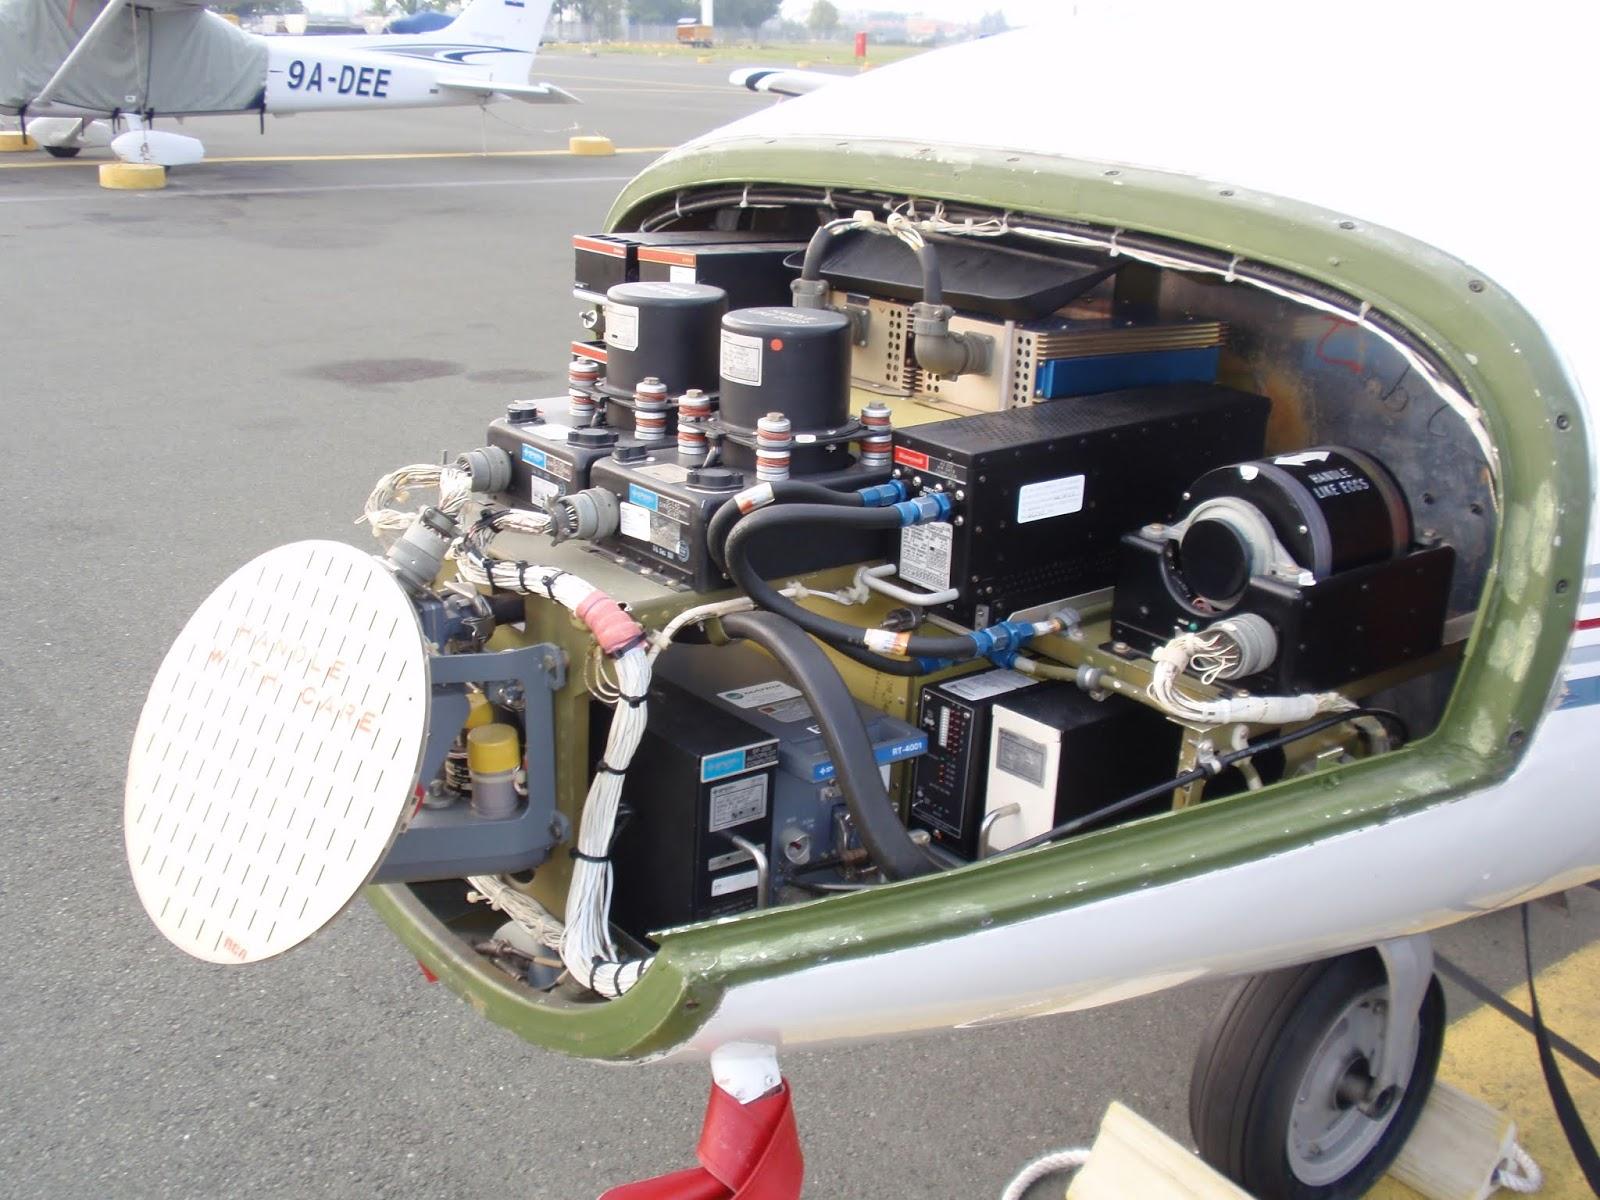 Cessna Citation I weather radar